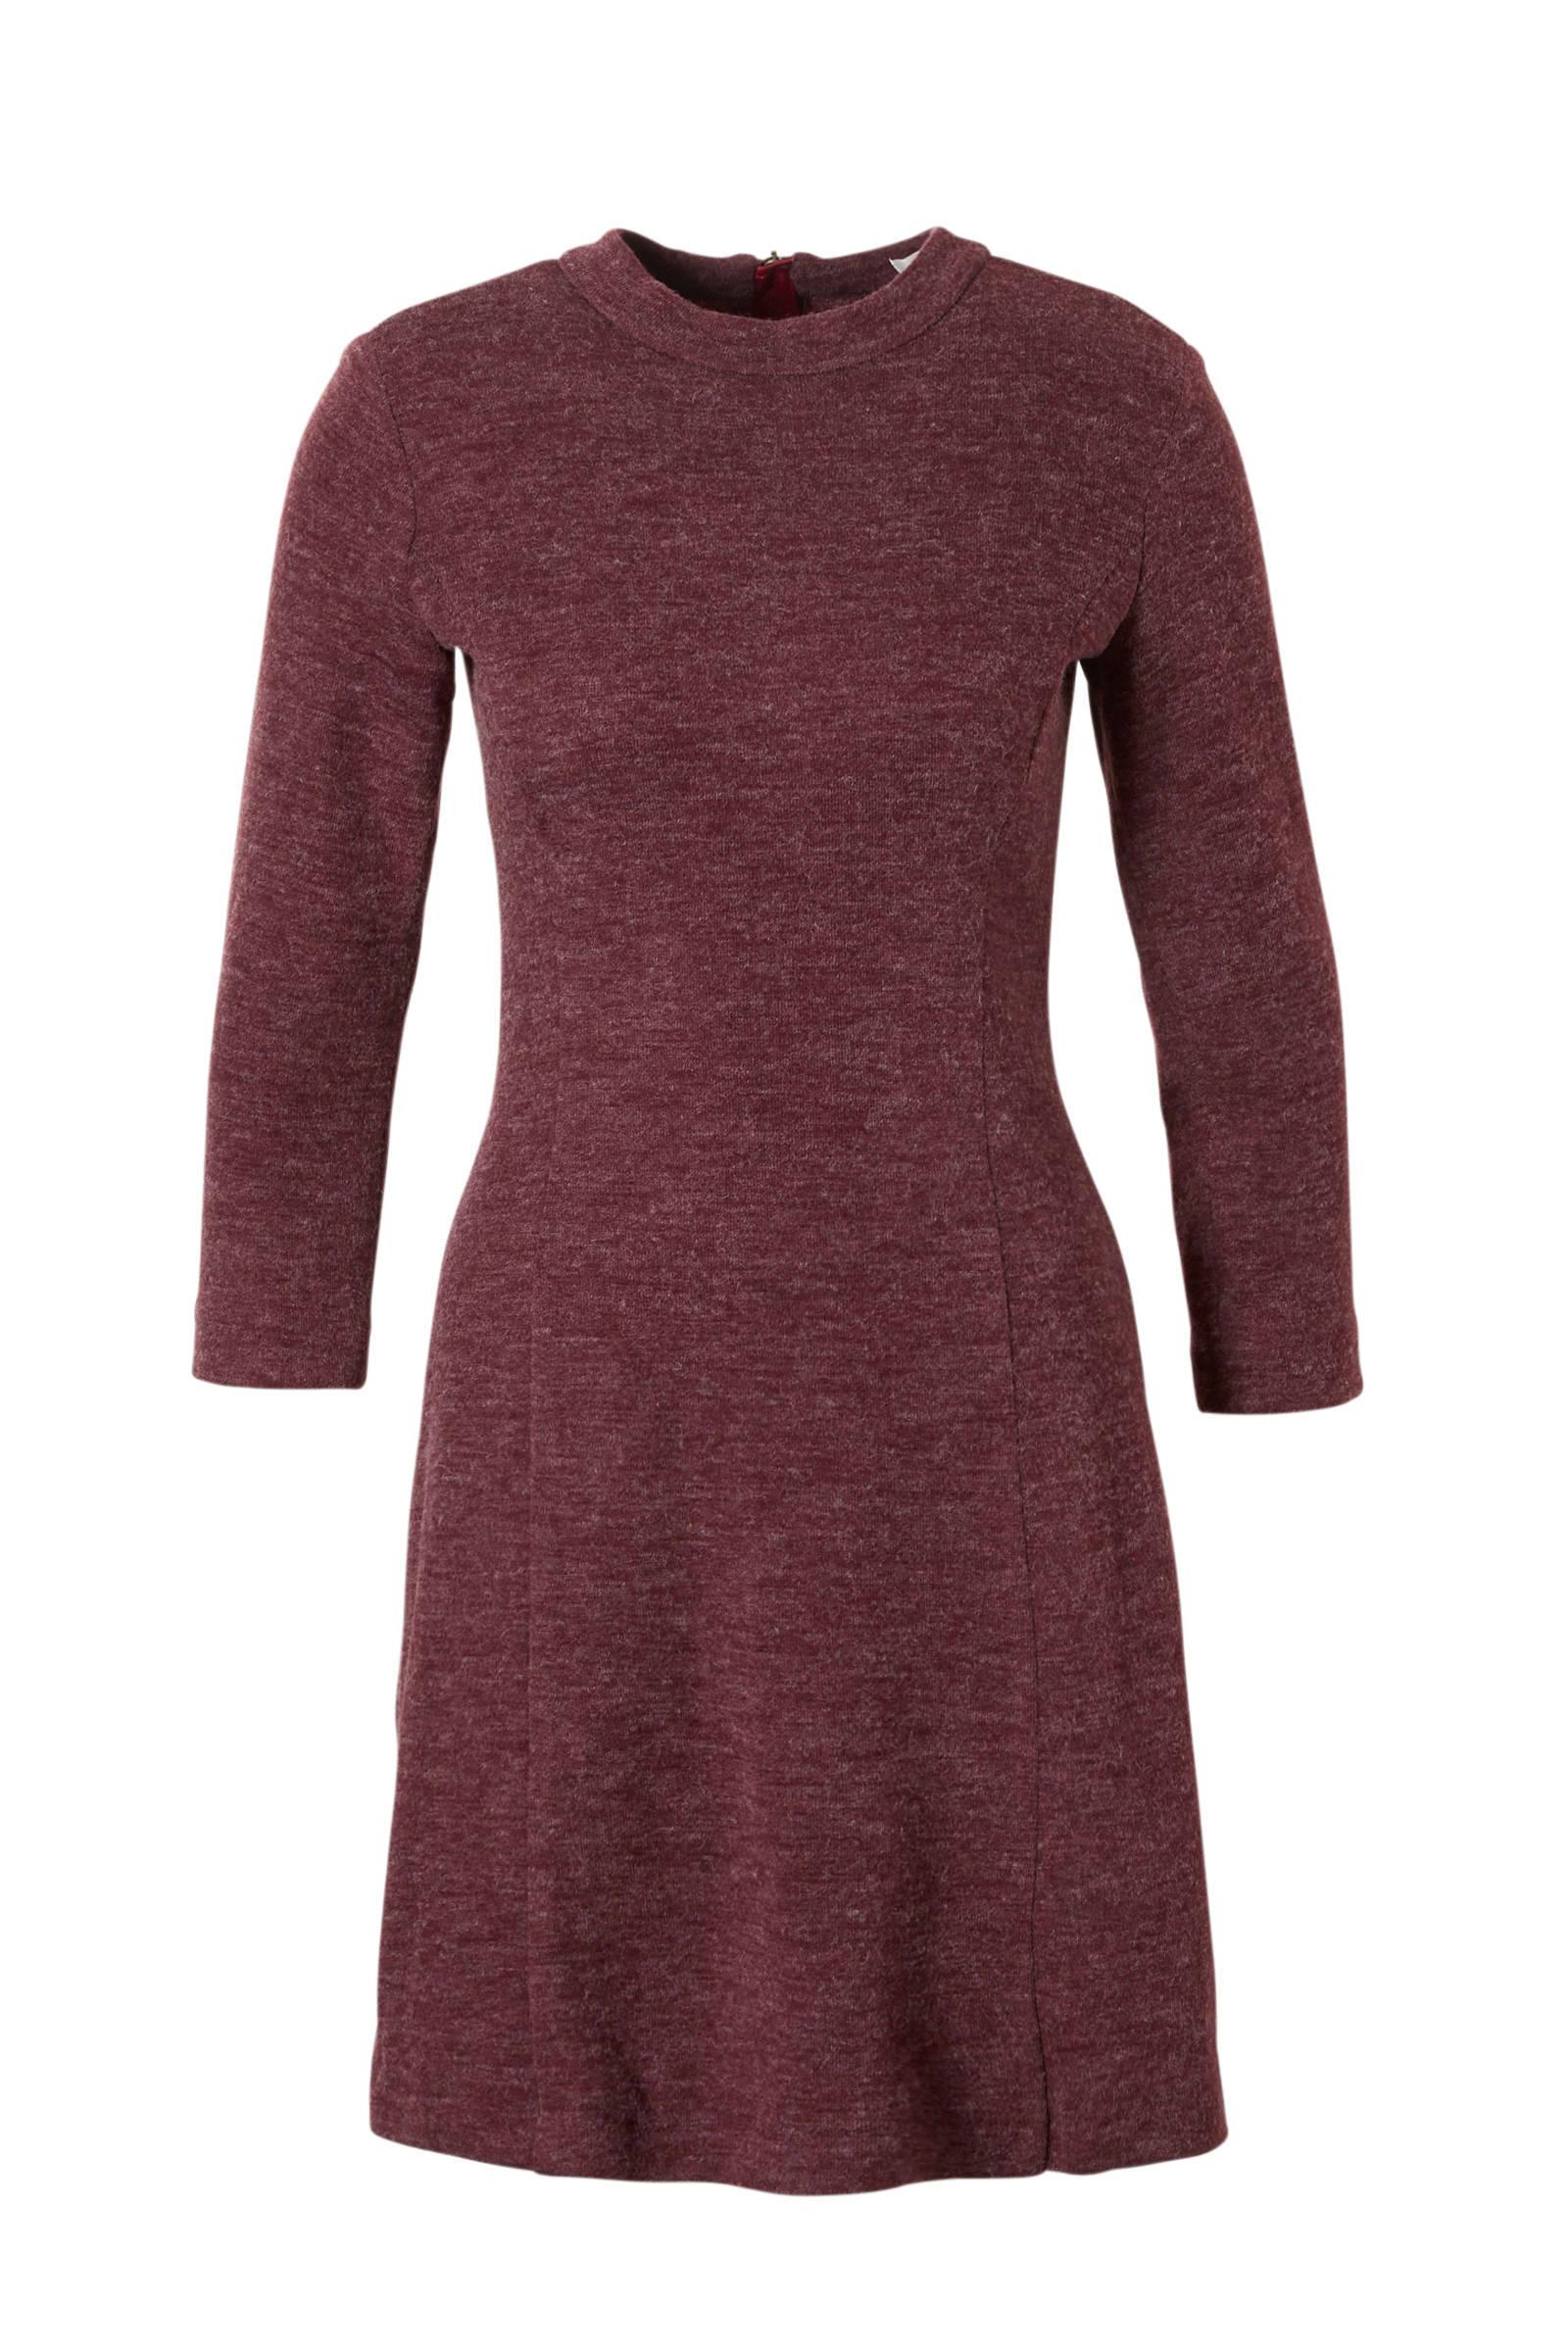 ESPRIT Women Casual gemêleerde jurk